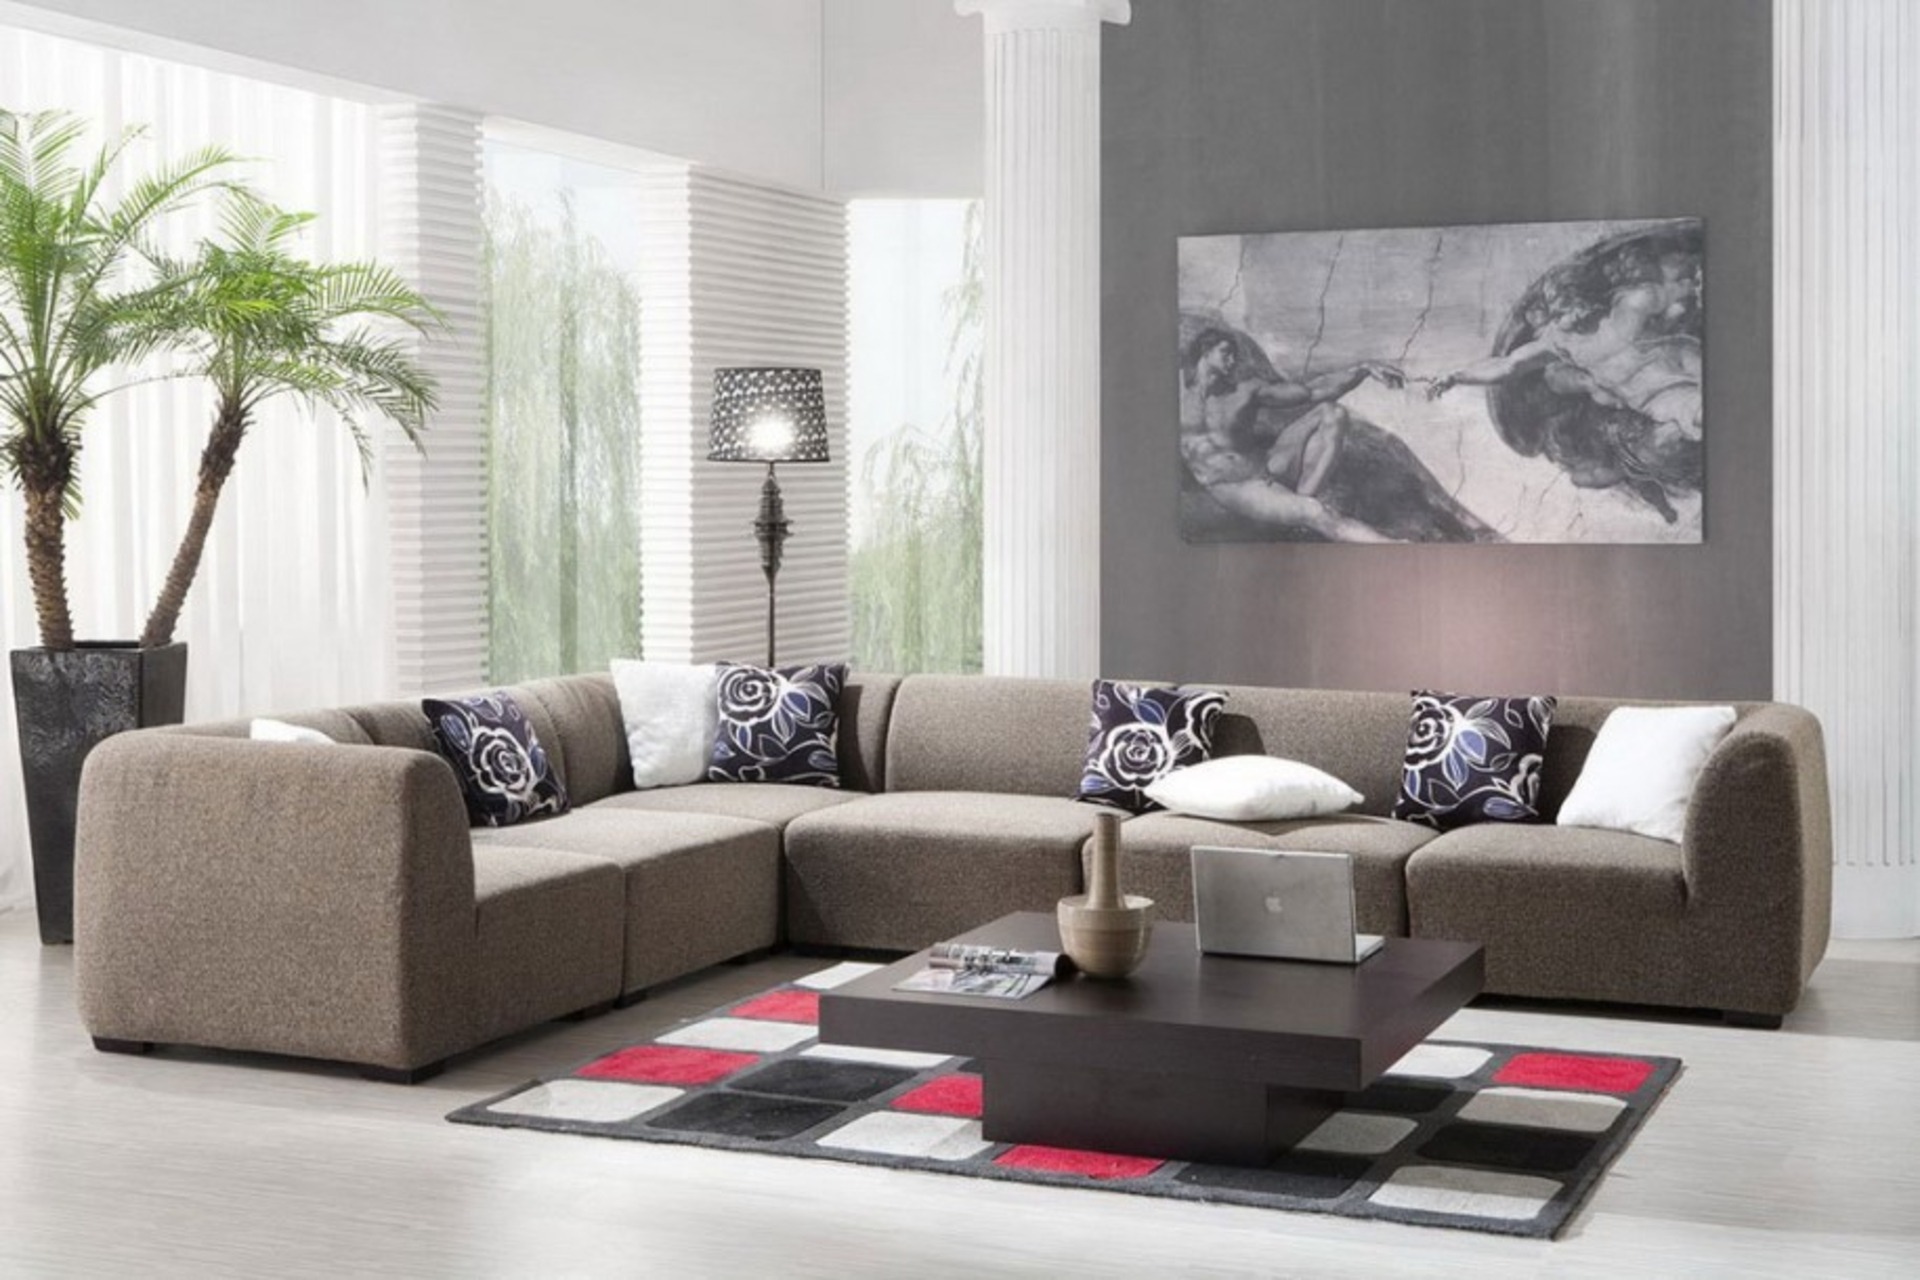 Nice Contemporary Living Room Design My Decorative